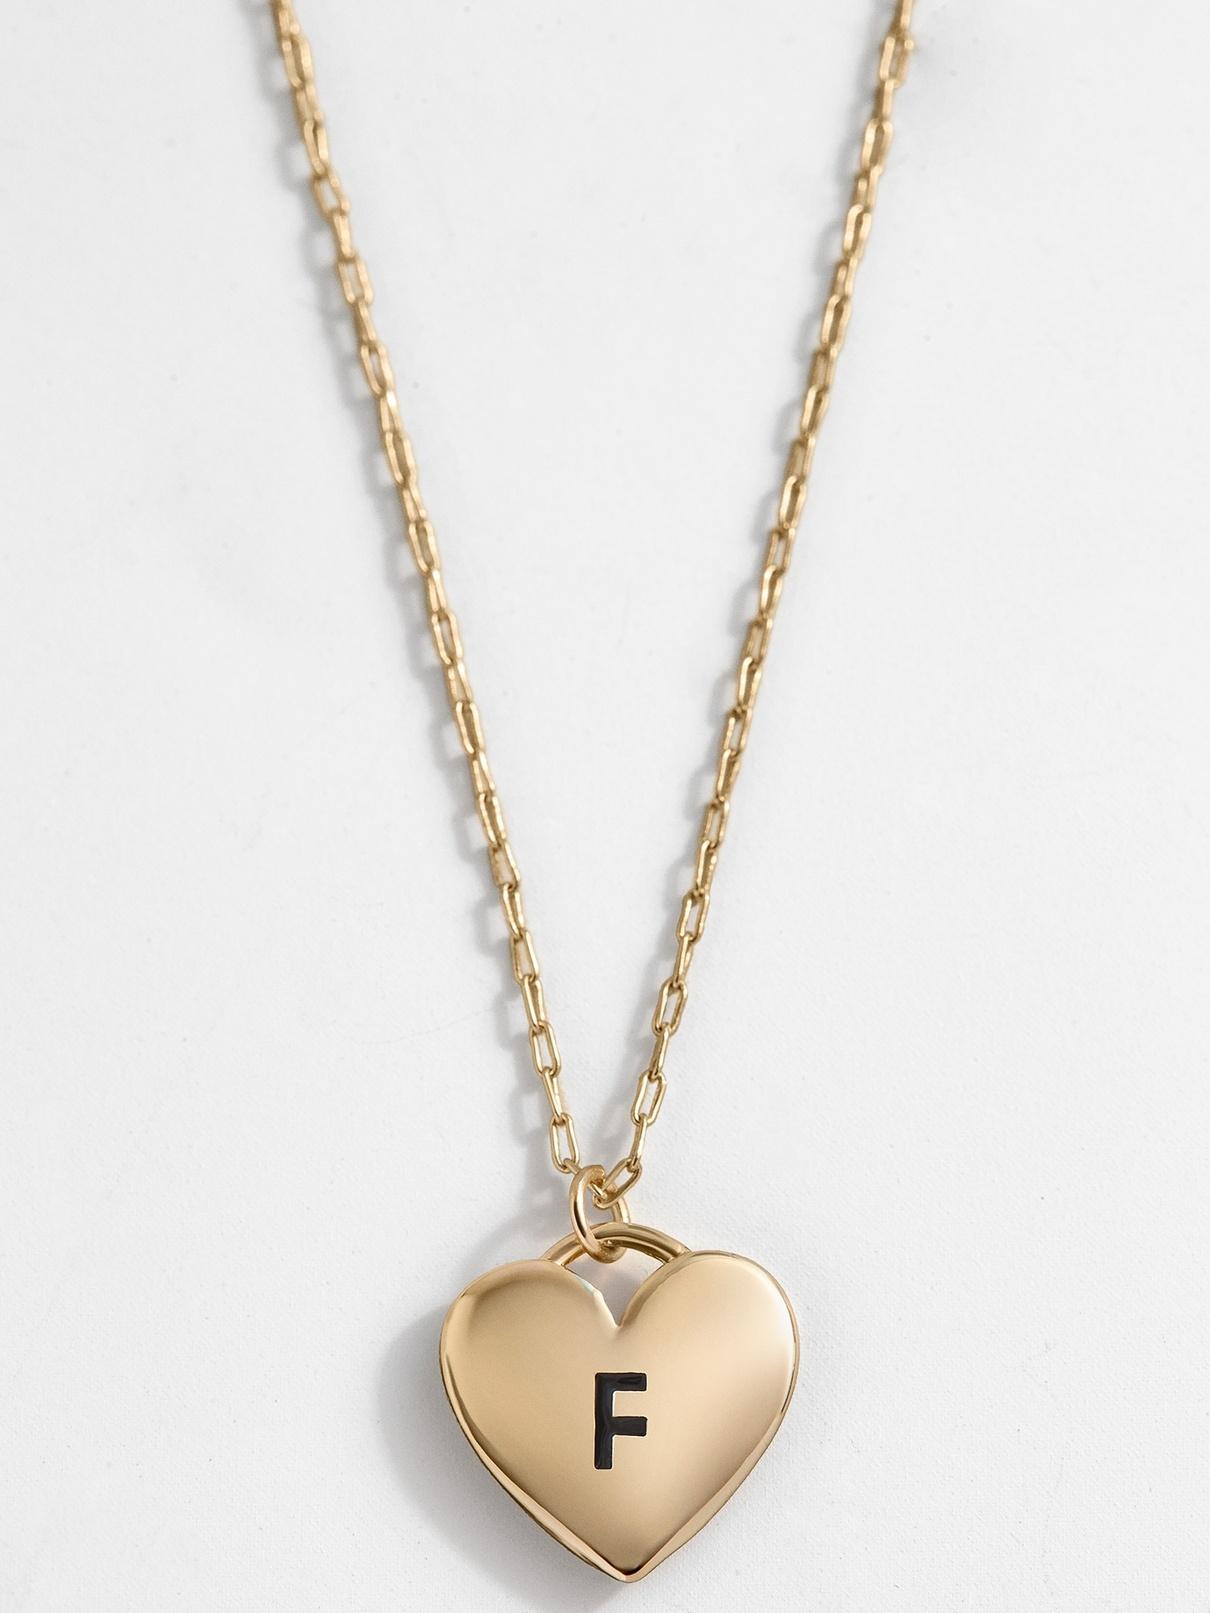 heart-necklace.jpg